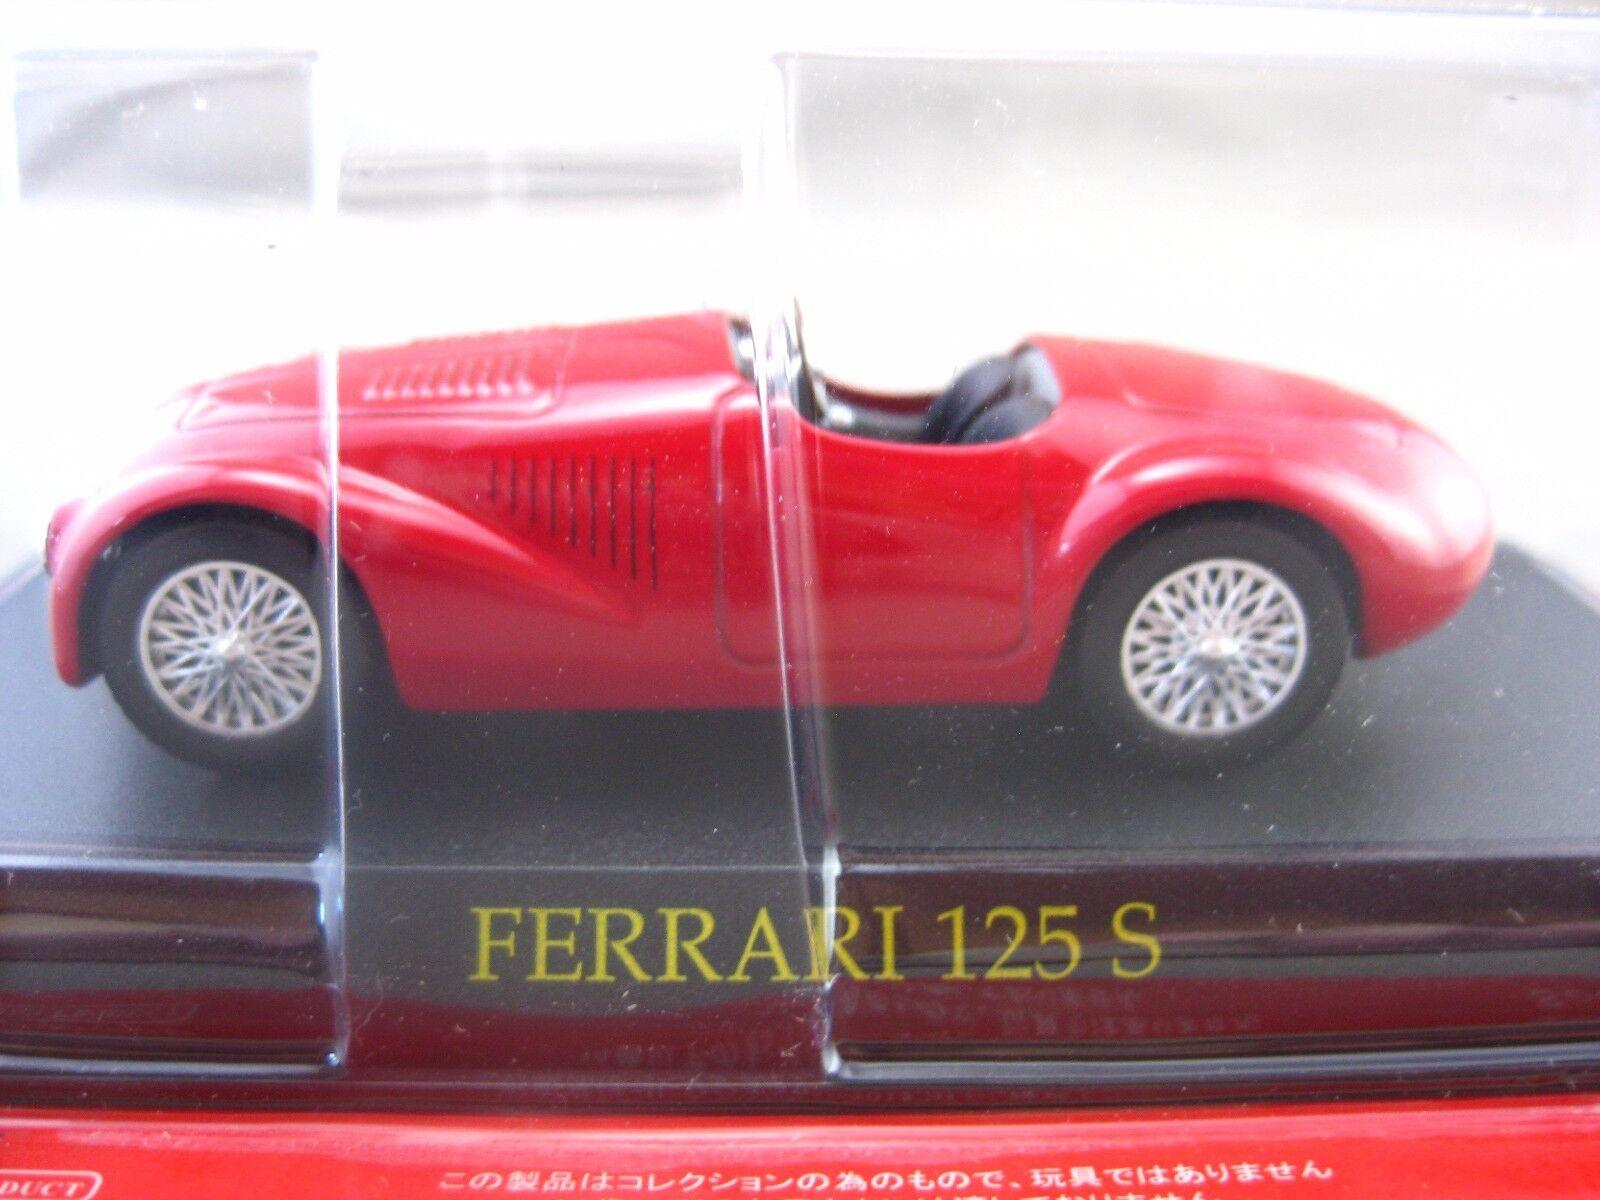 Ferrari 125 S Hachette 1 43 Diecast Car Vol.16